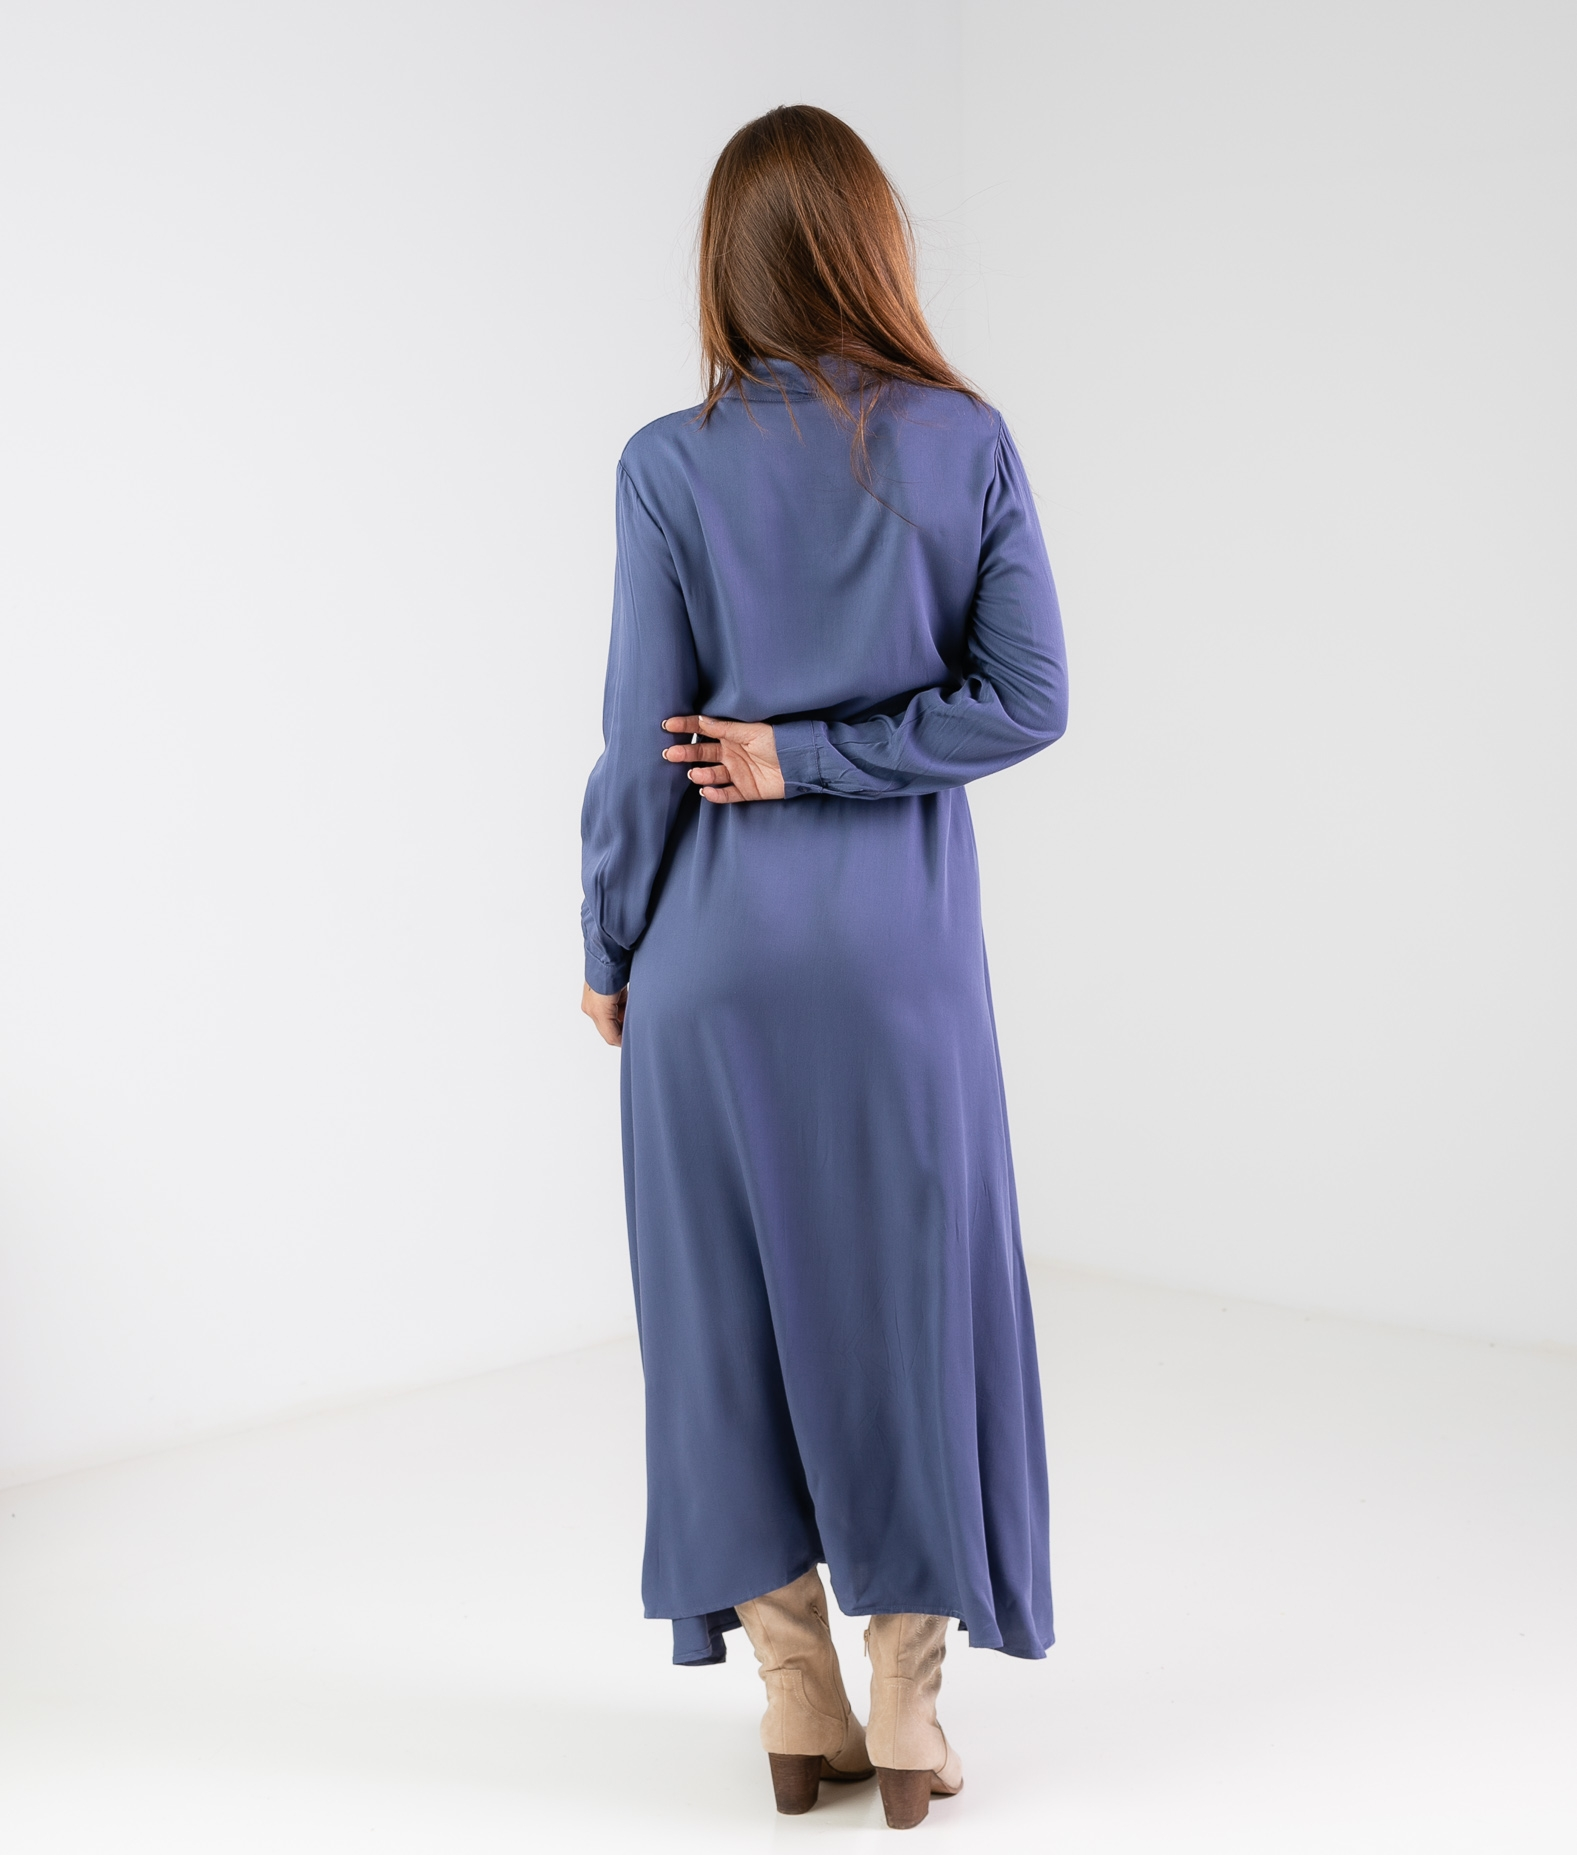 Dress Texon - Blue Denim